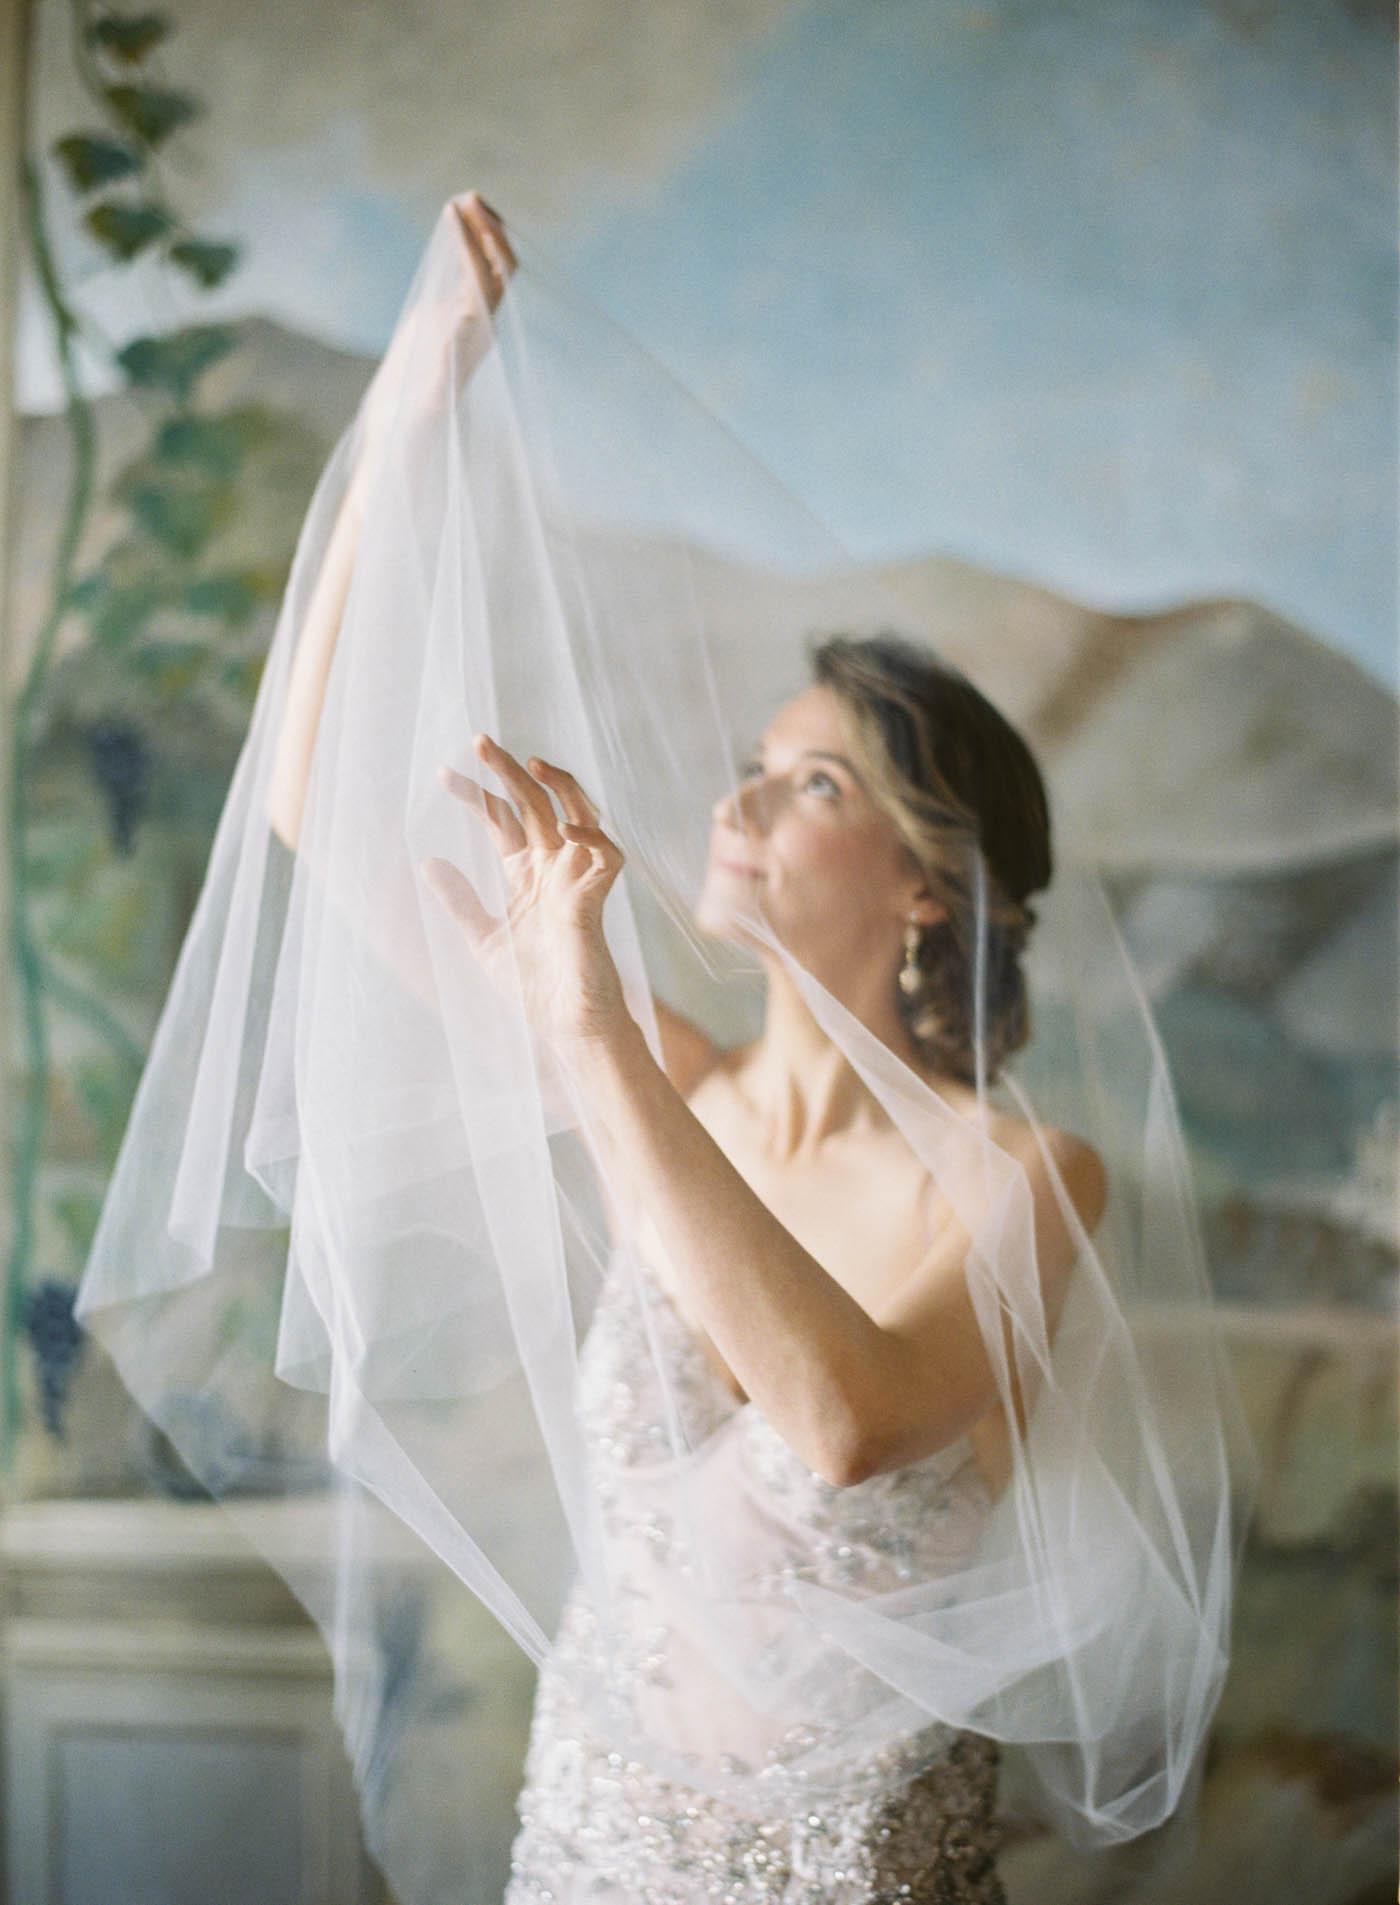 Villa_Cetinale_Wedding-17-Jen_Huang-ElanJacob-156-Jen_Huang-007325-R1-016.jpg